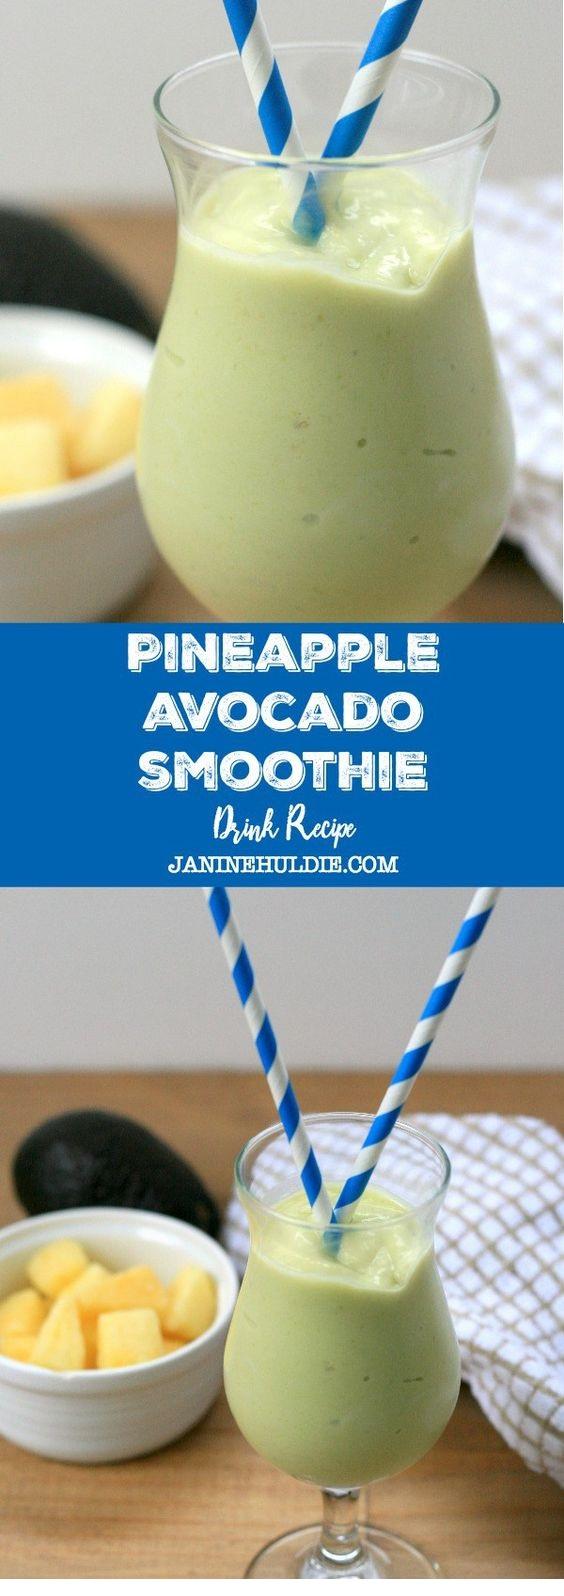 Pineapple Avocado Smoothie Drink Recipe